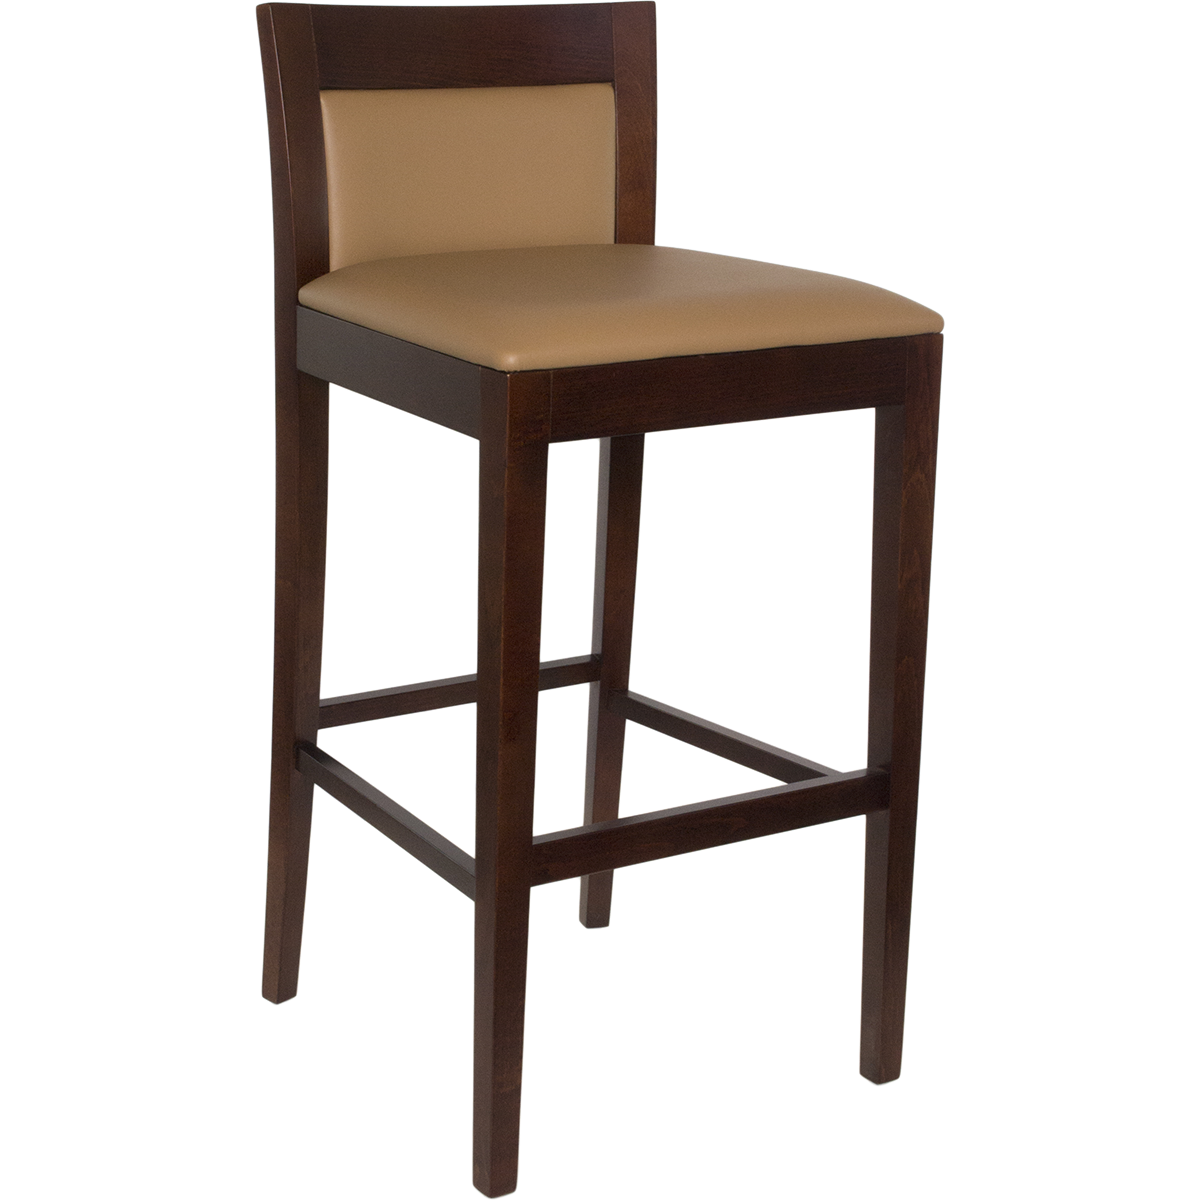 Wood Upholstered Square Inset Back Barstool